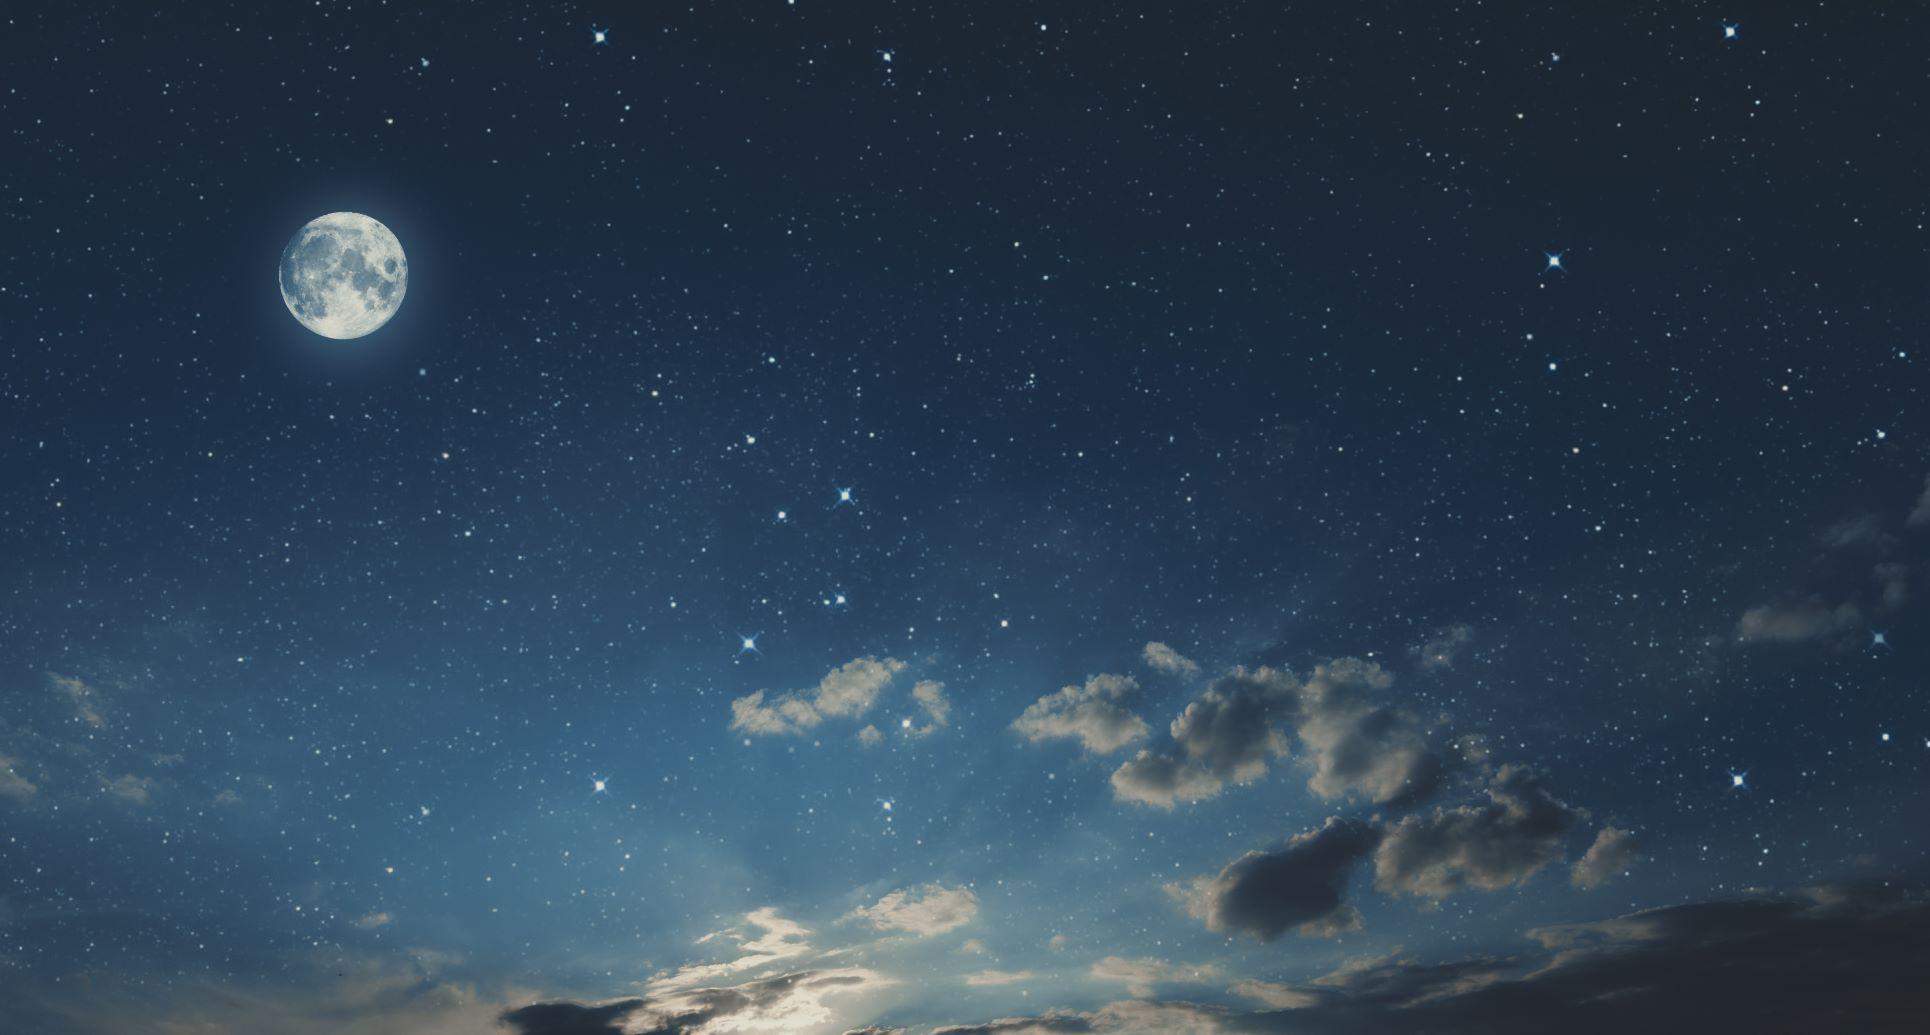 Photo of a night sky